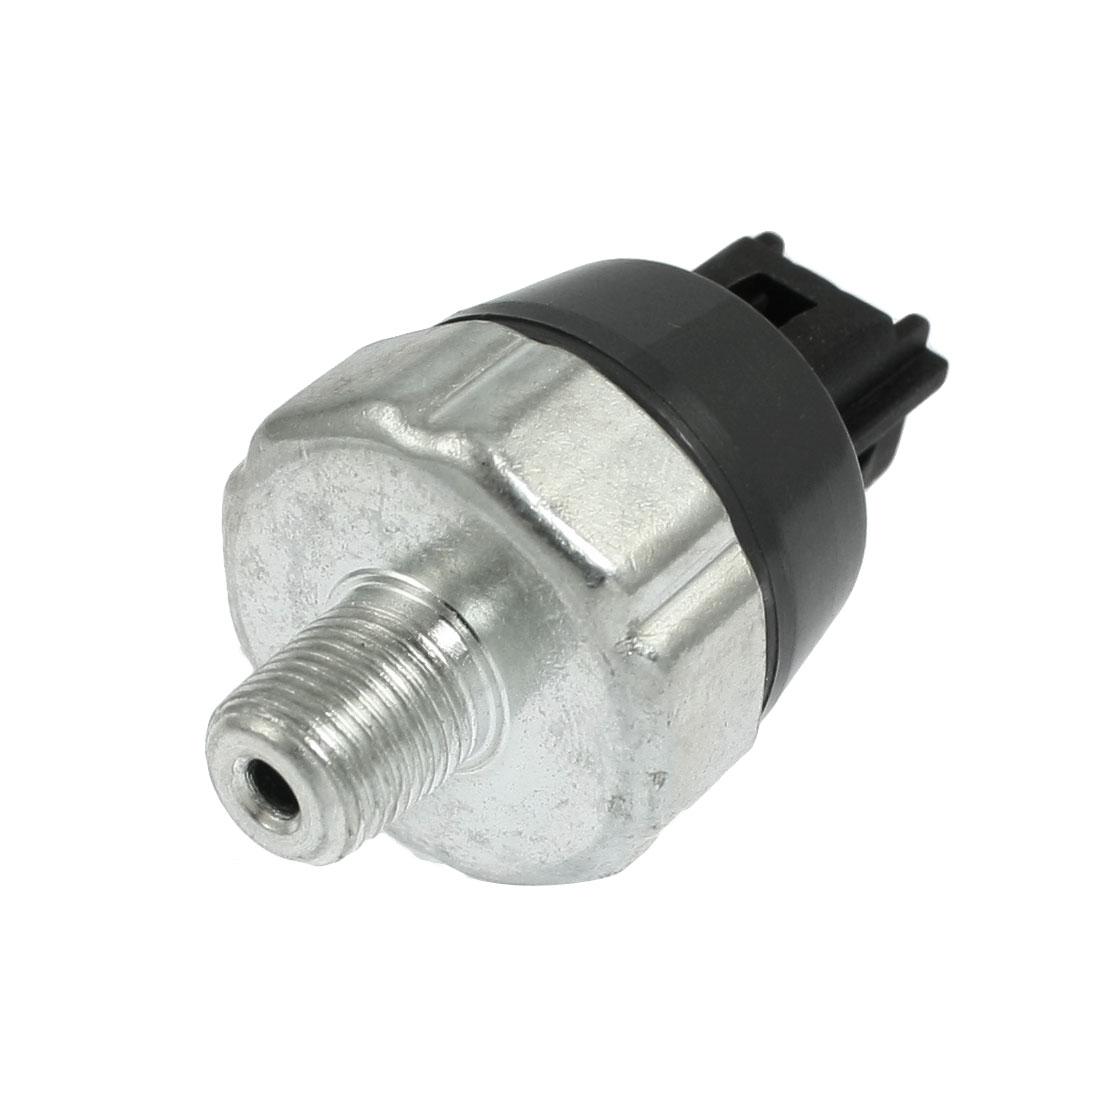 Engine Oil Pressure Switch Sensor Assembly 83530-60020